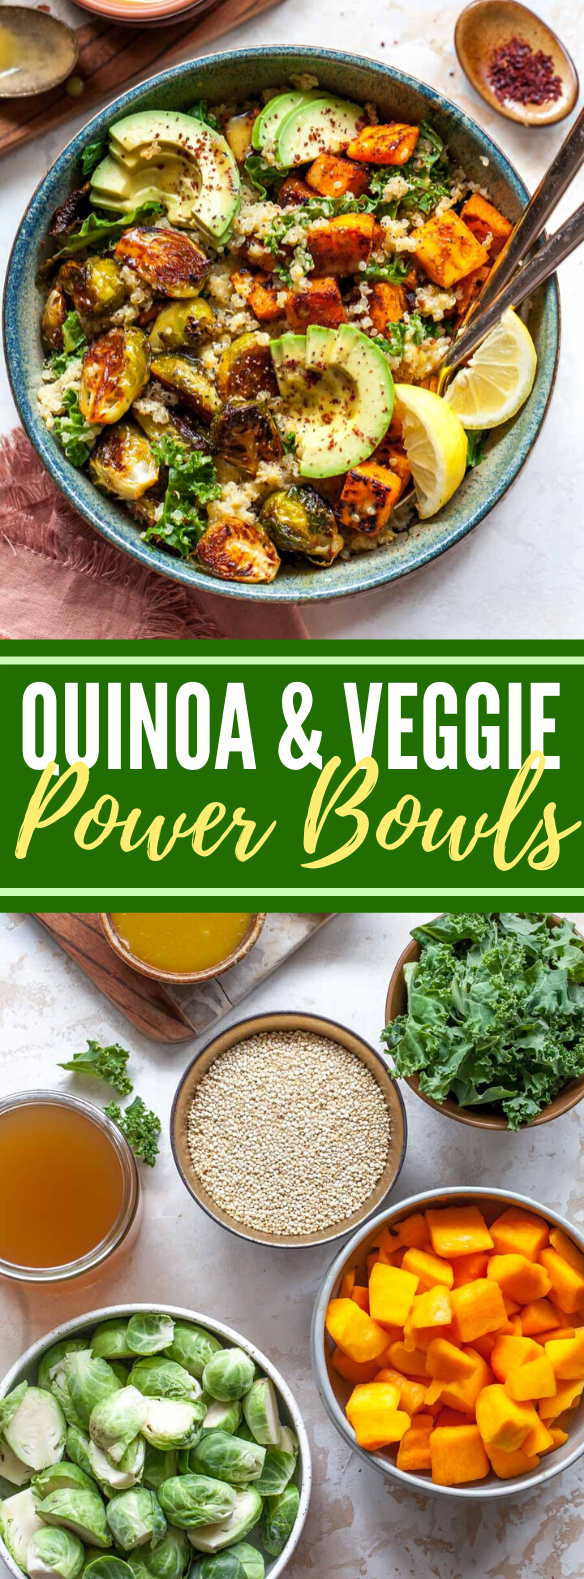 Quinoa and Veggie Power Bowls #vegan #dinner